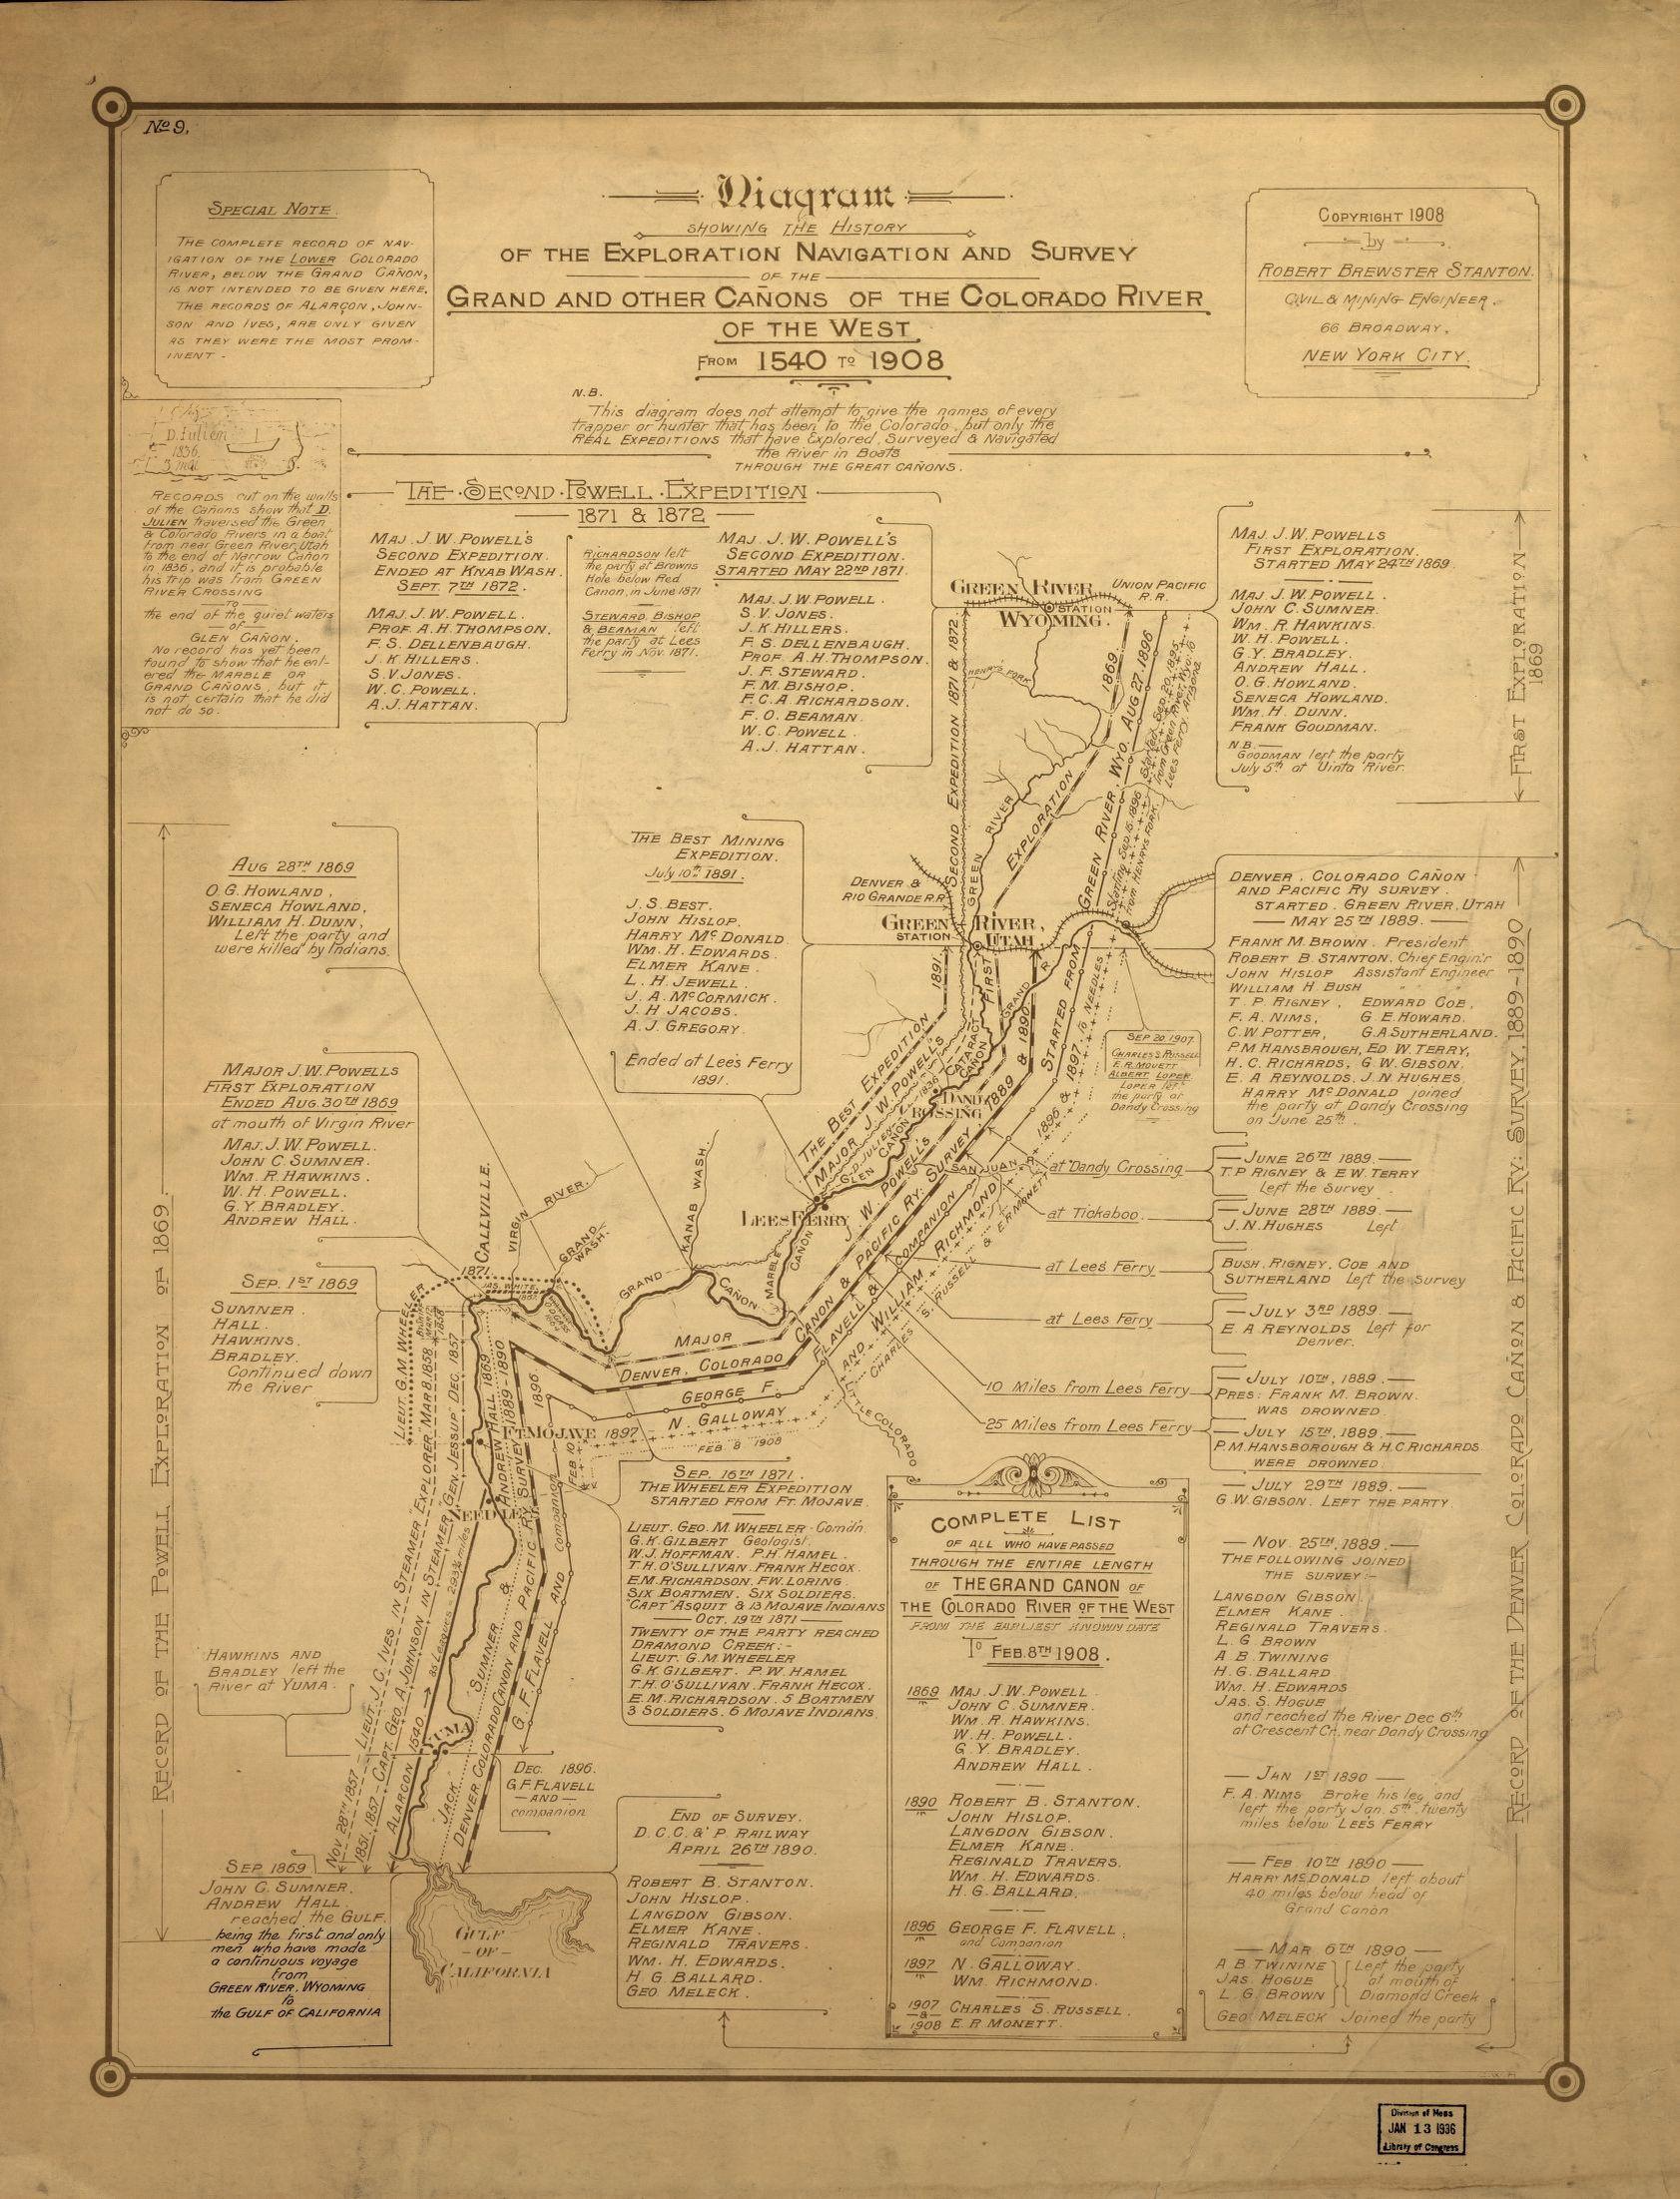 1908 - Explorations of the Colorado River